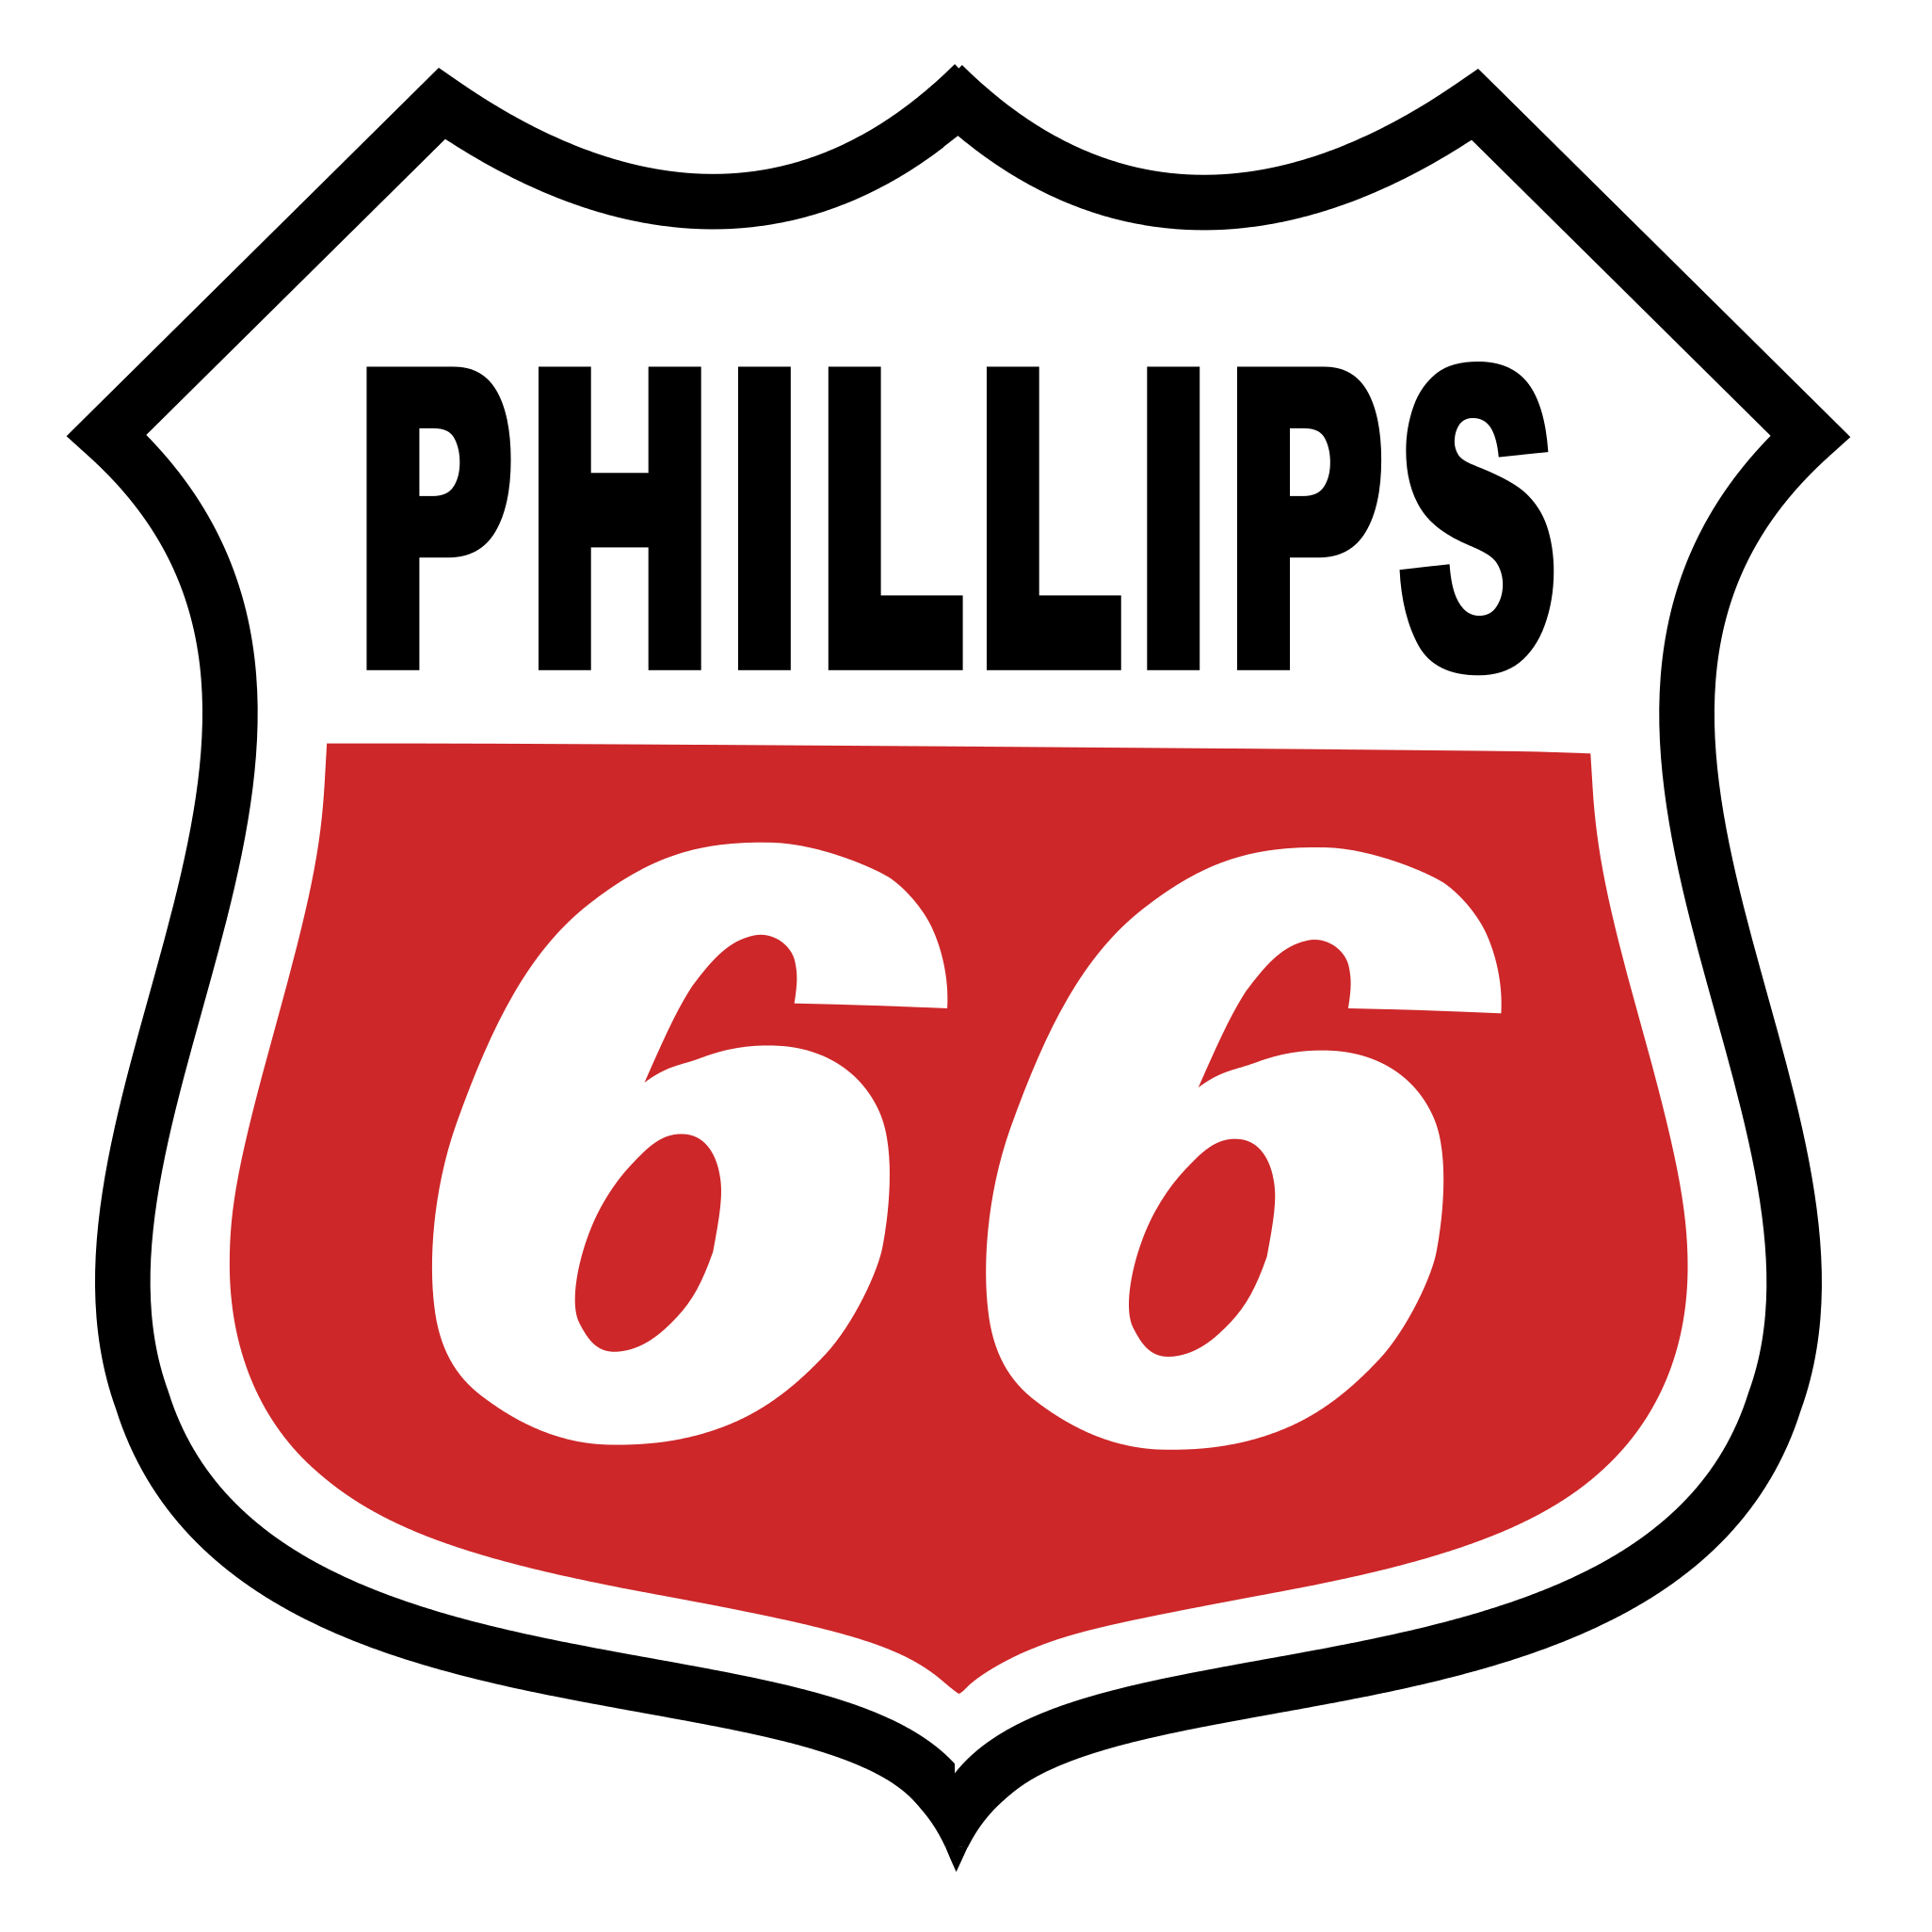 PNGPIX-COM-Phillips-66-Logo-PNG-Transparent.png